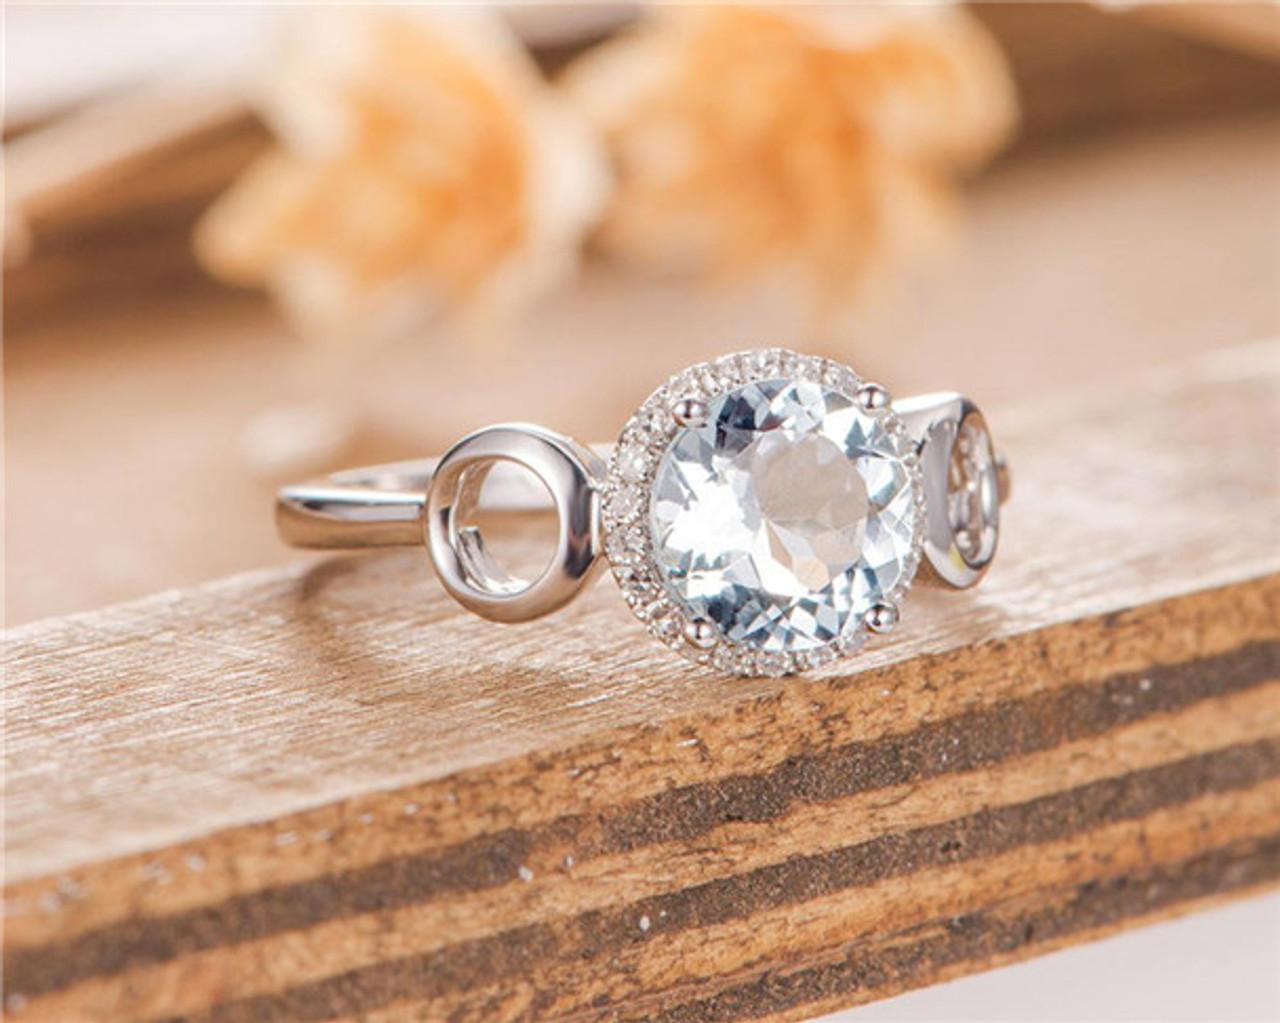 bd6144b893d65 Aquamarine Engagement Ring Halo Diamond Half Eternity Band White Gold Women  Bridal Promise Ring Birthstone Gift